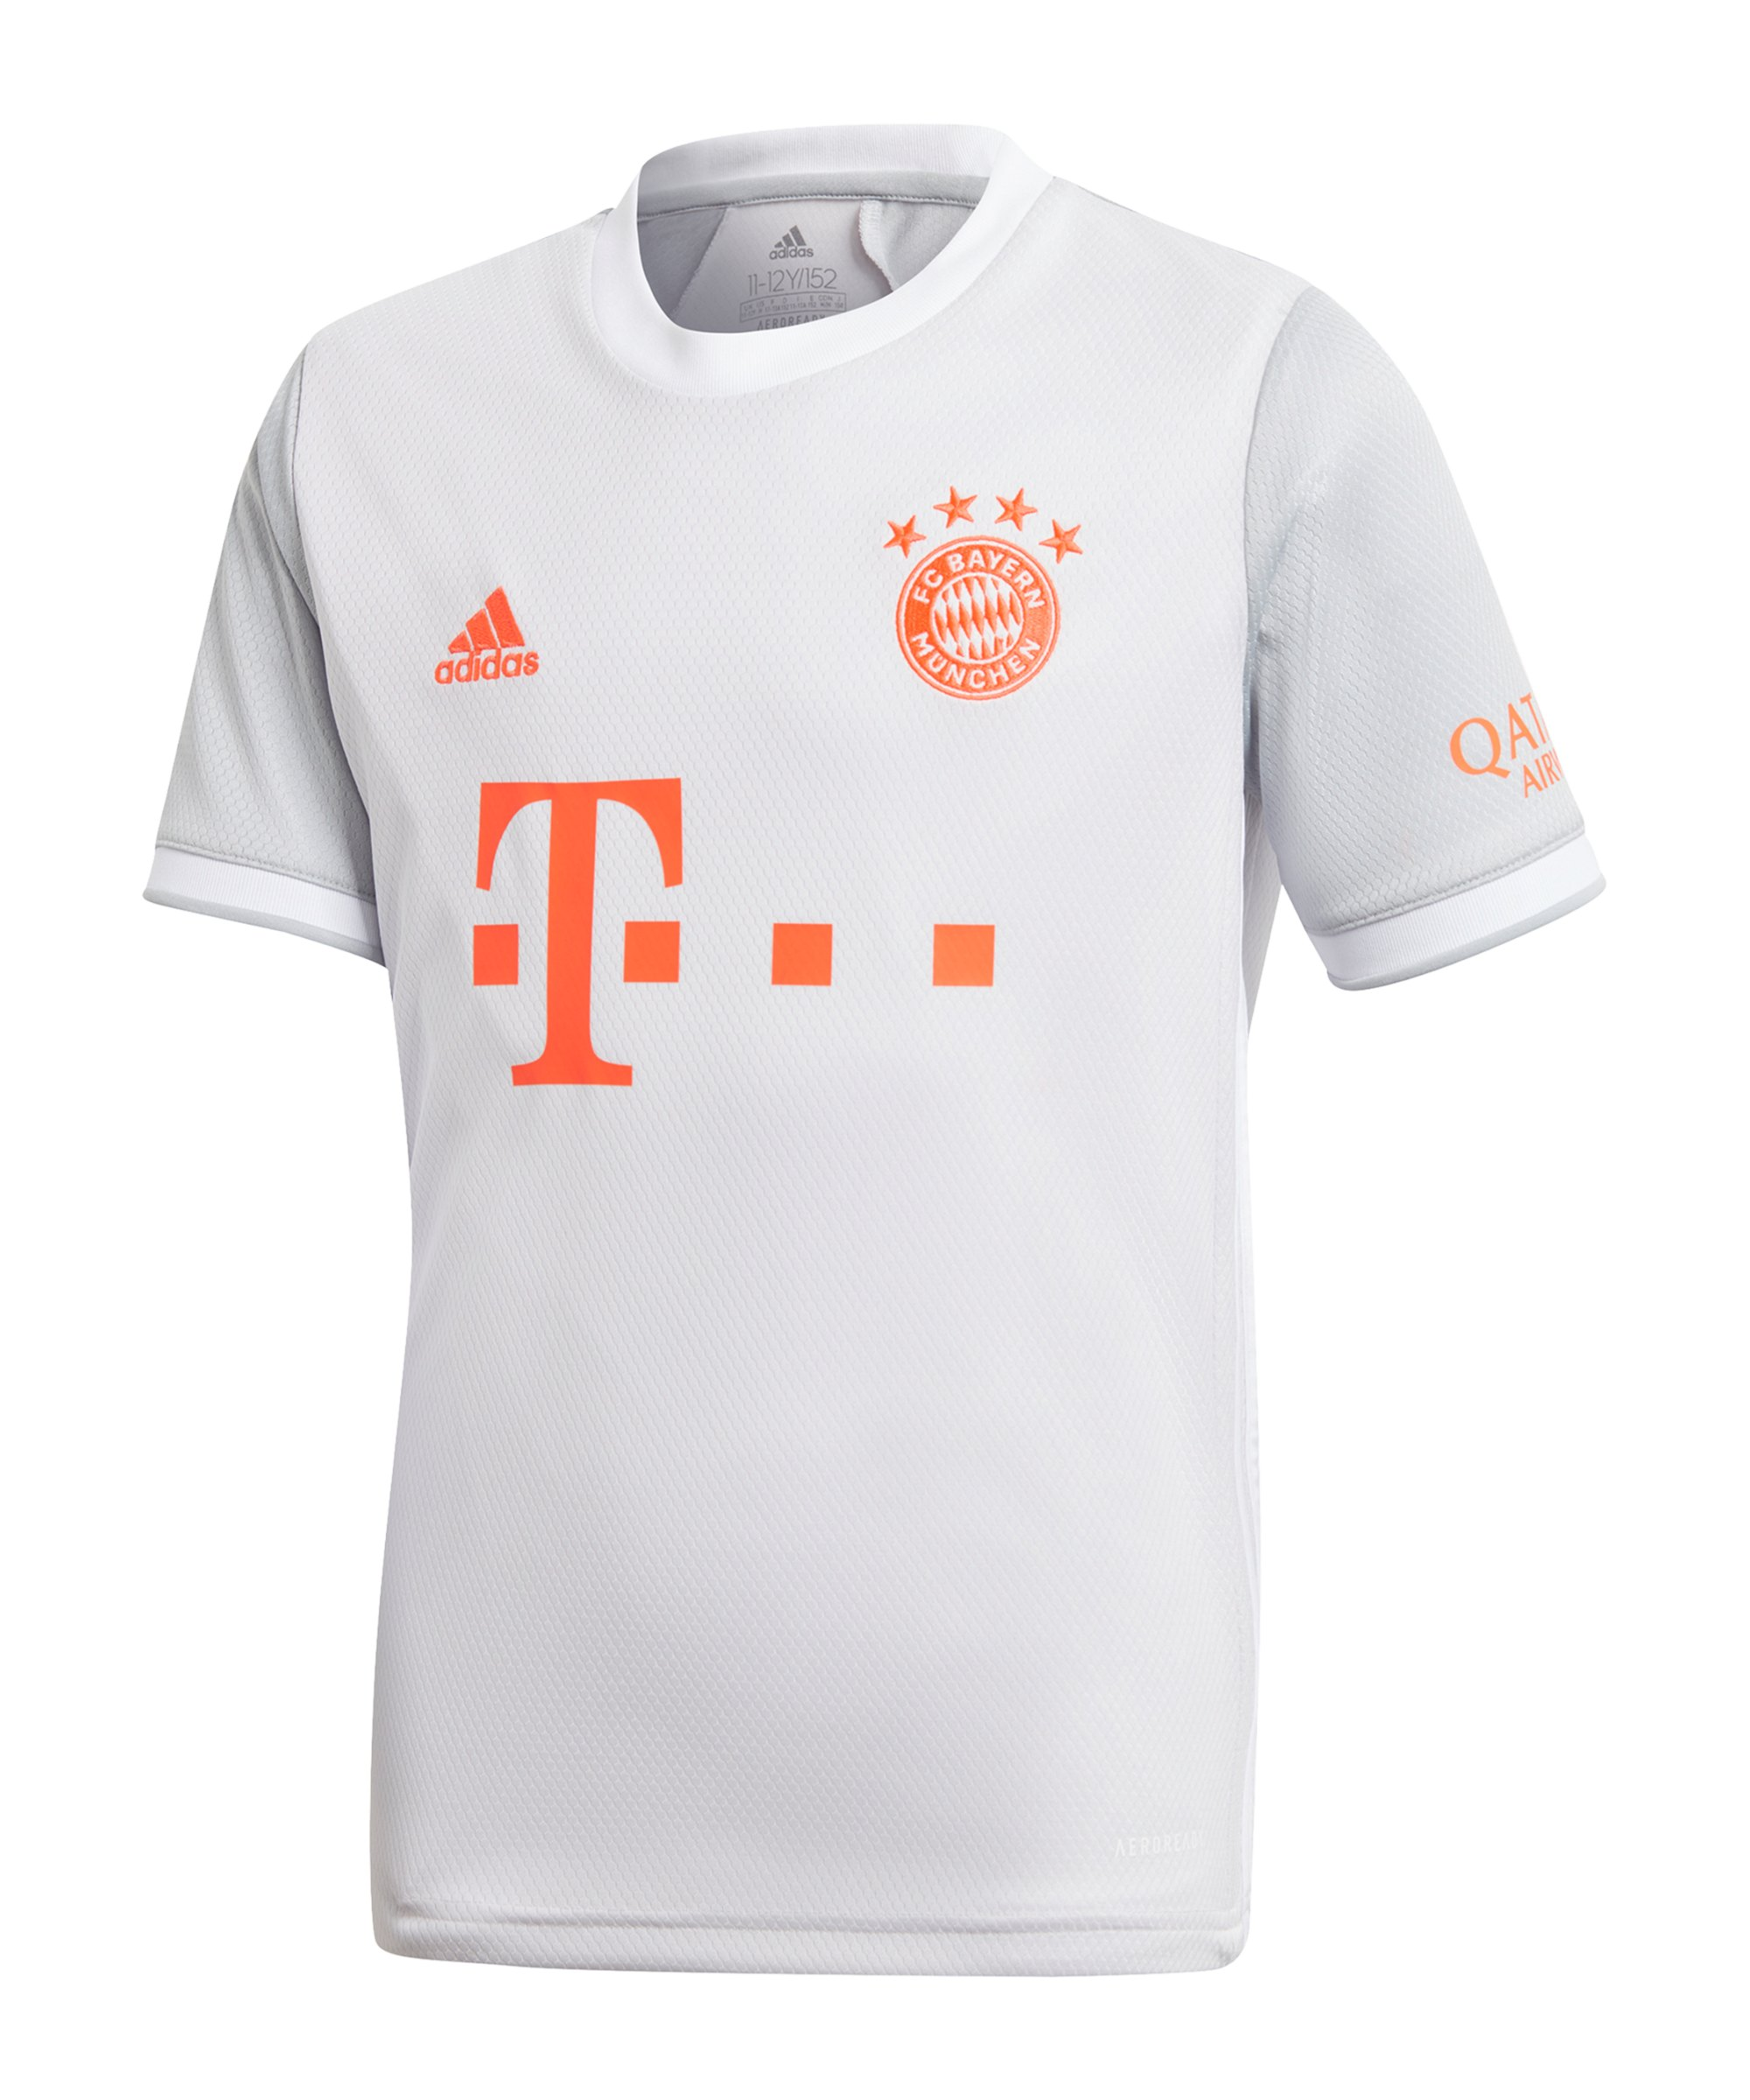 adidas FC Bayern München Trikot Away 2020/2021 Kids Weiss - grau